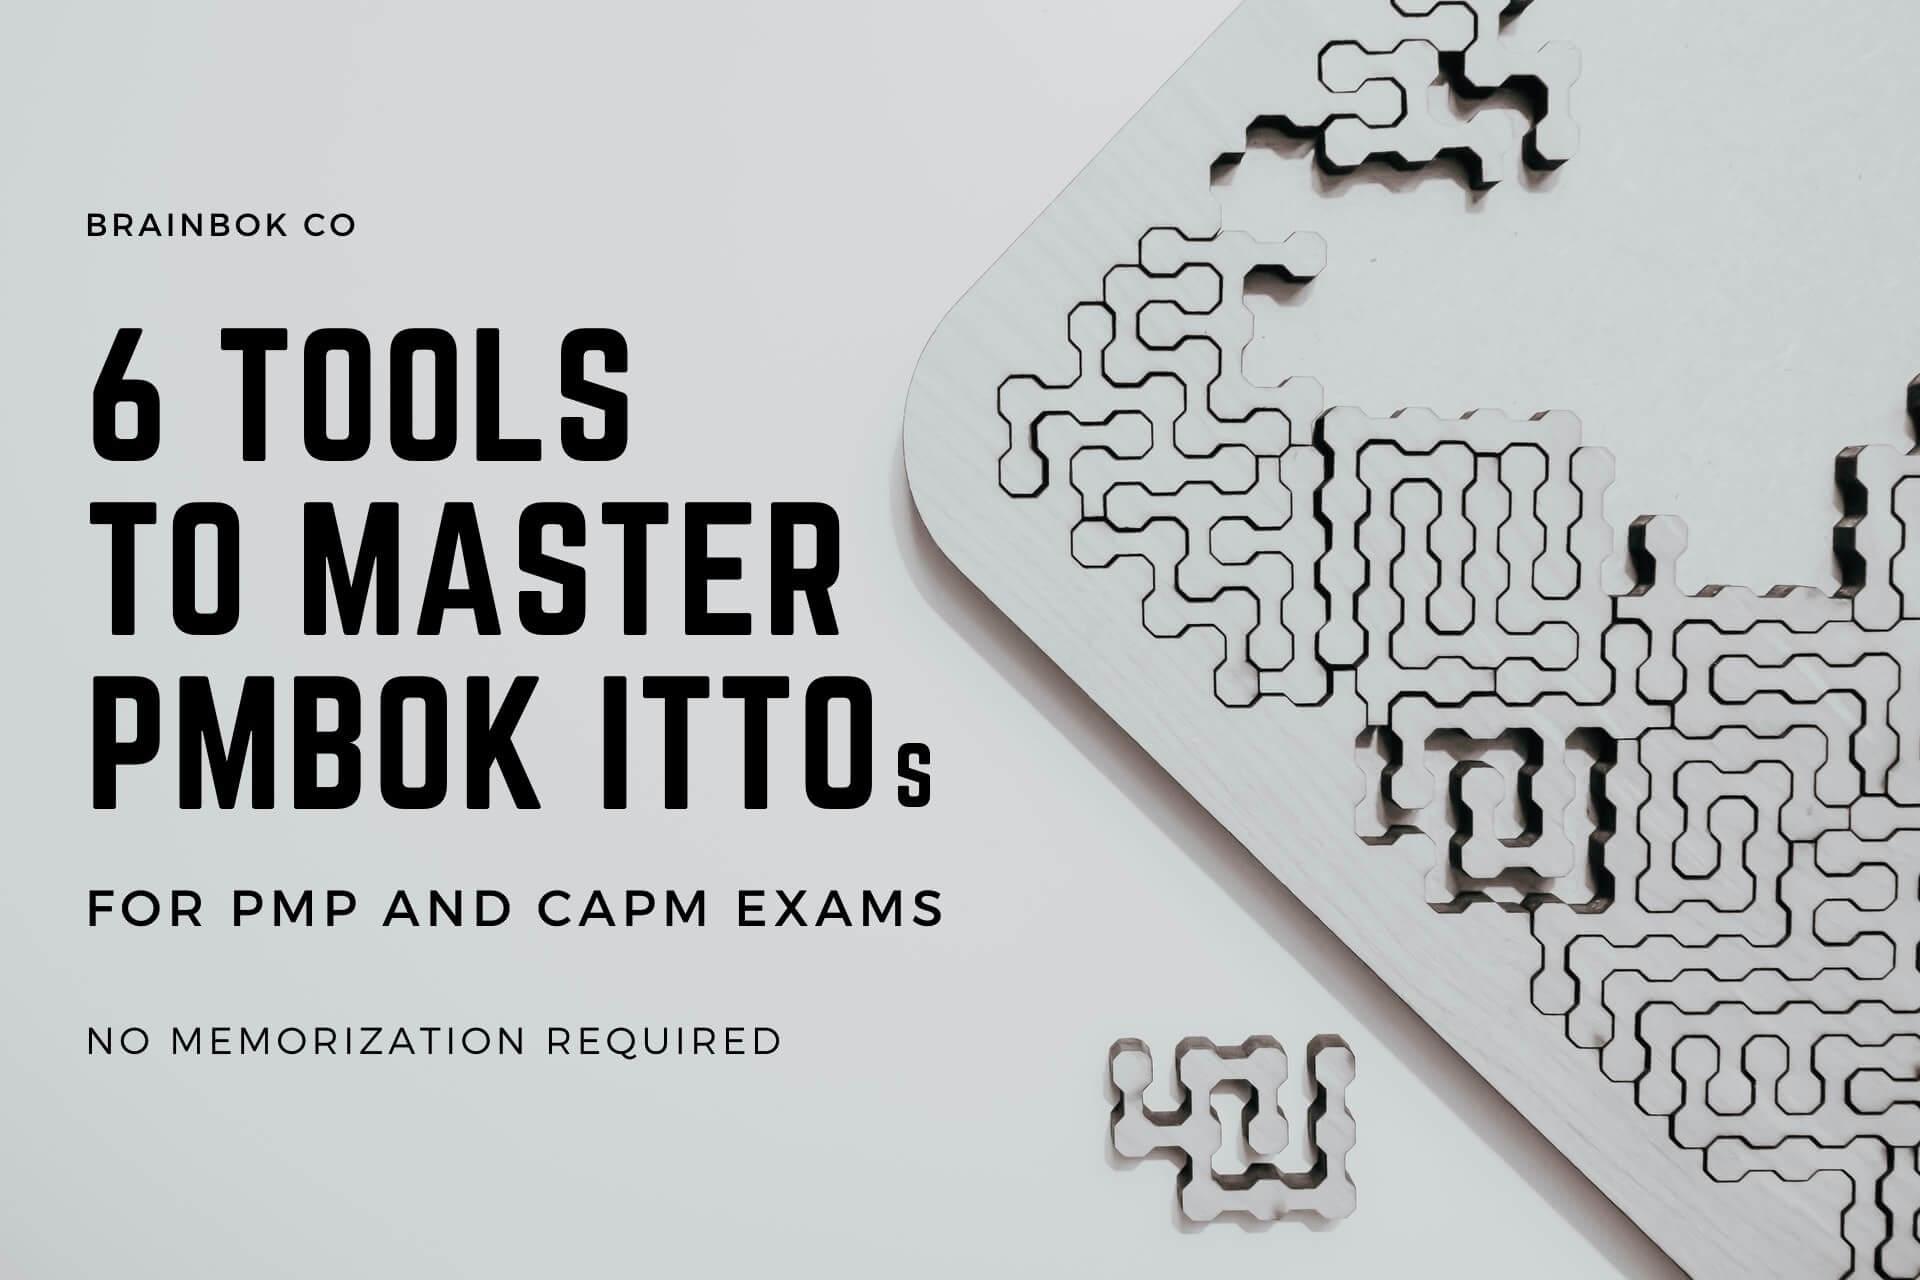 6 Tools to Master PMBOK ITTOs